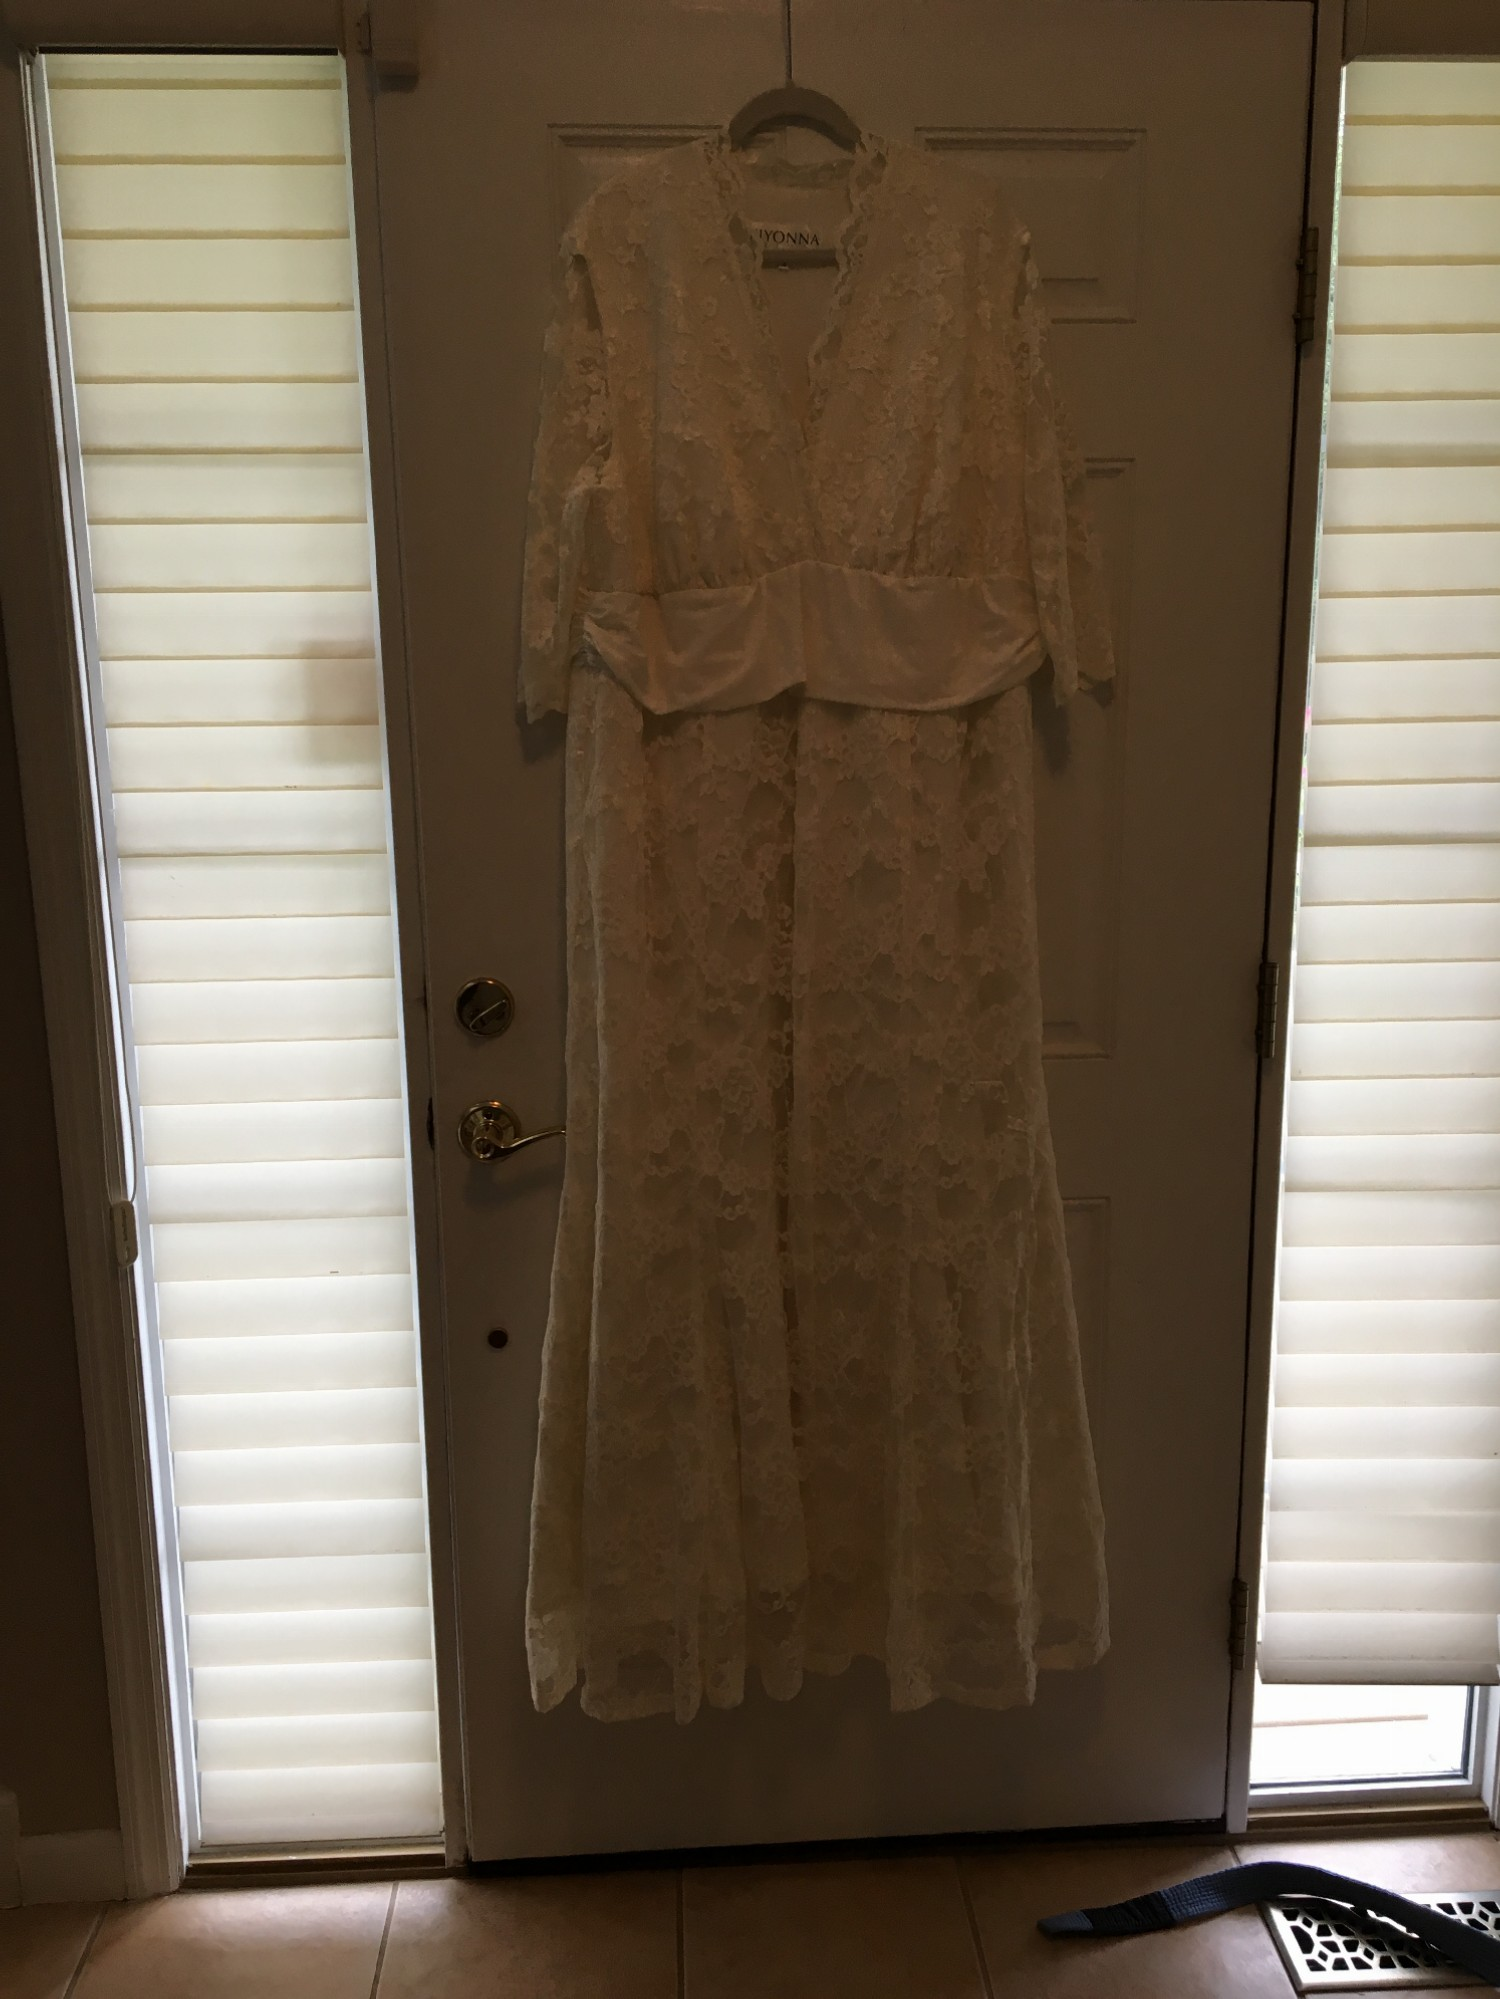 6d2ac8c8e99 Kiyonna Amour Lace Used Wedding Dress on Sale 48% Off - Stillwhite